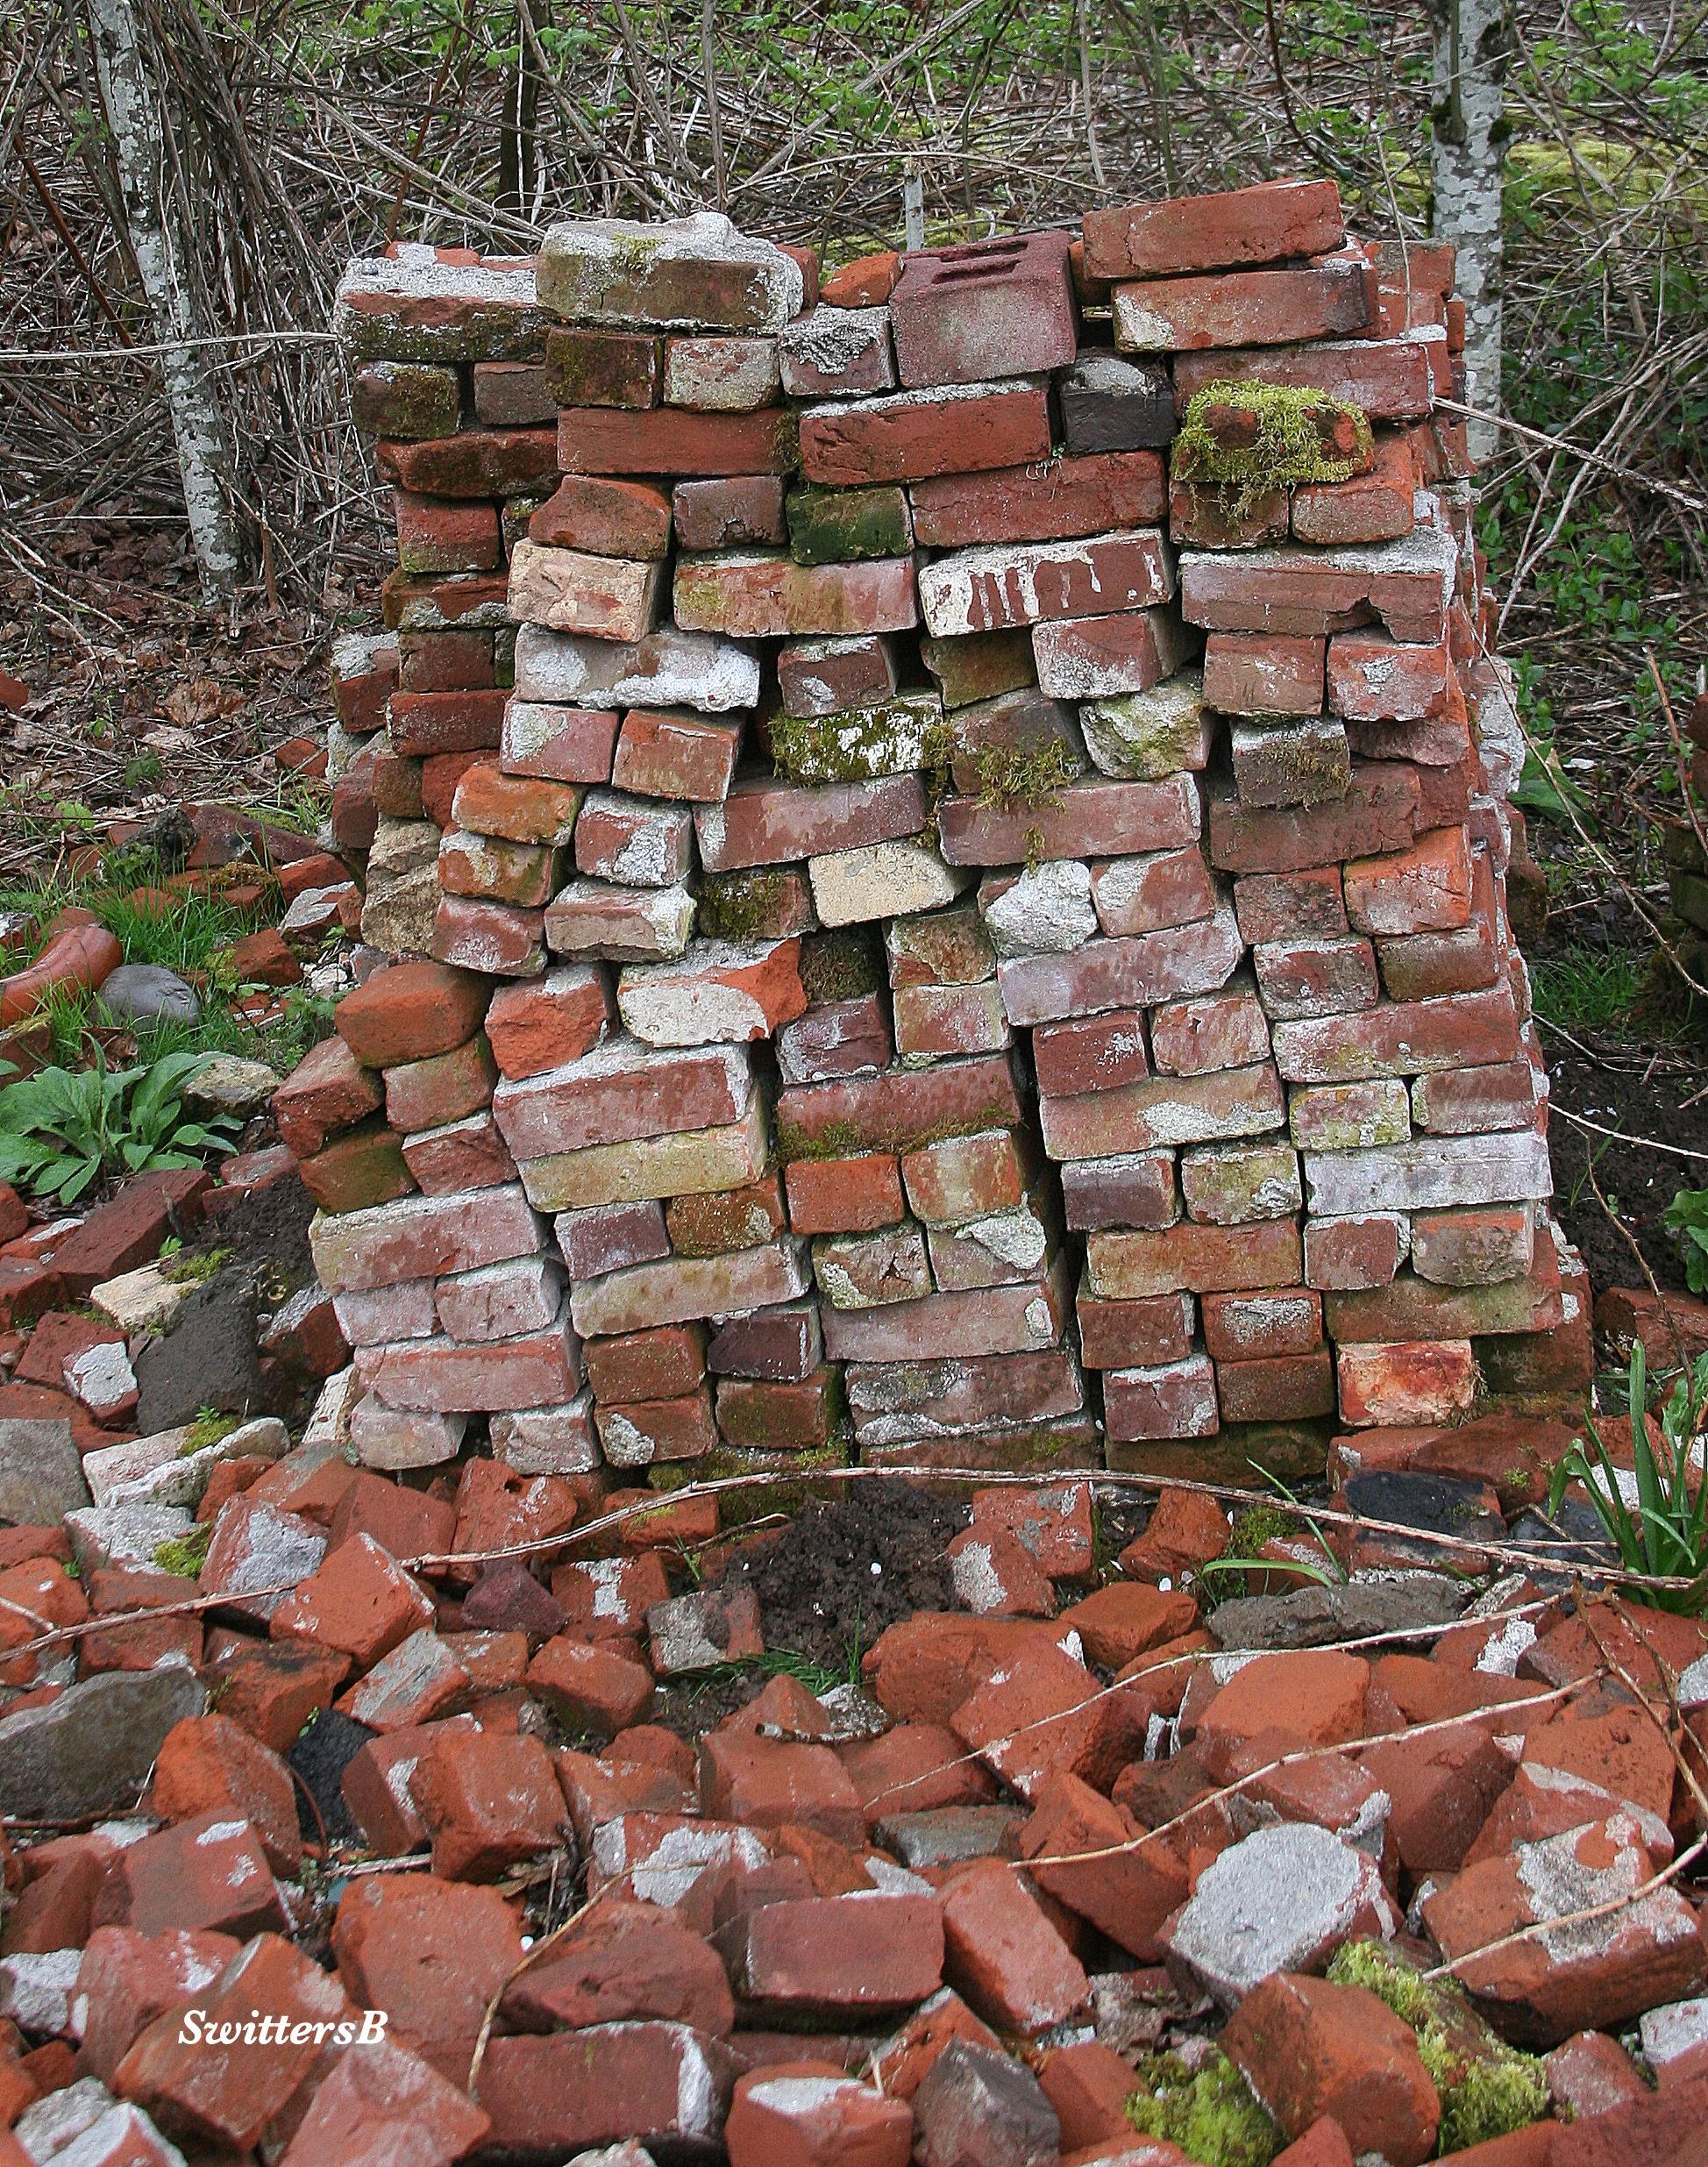 Old Bricks (How to Make Bricks) & Salvage Memories ...